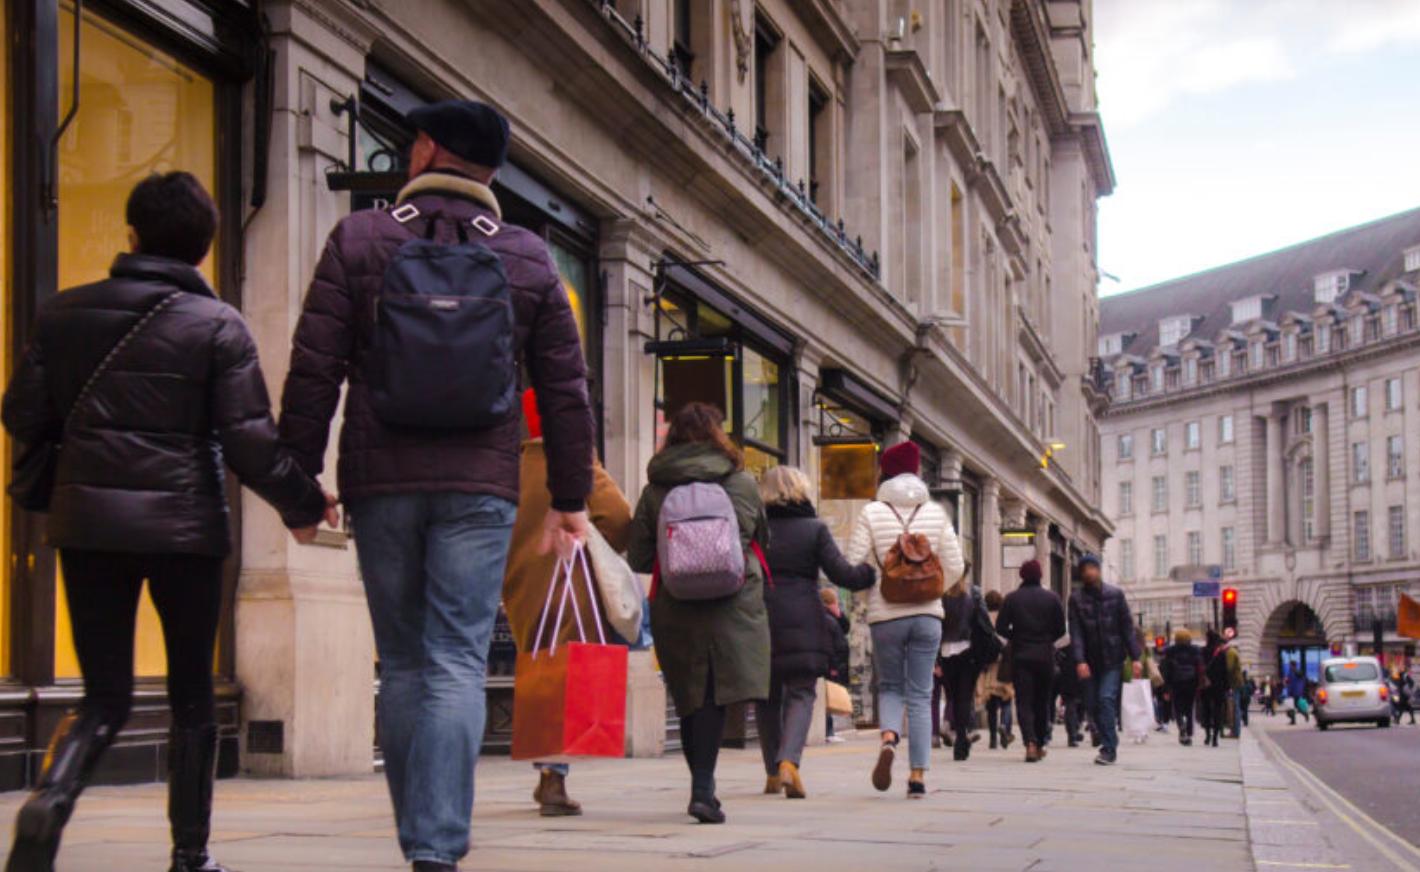 Retailers cut 24,000 jobs